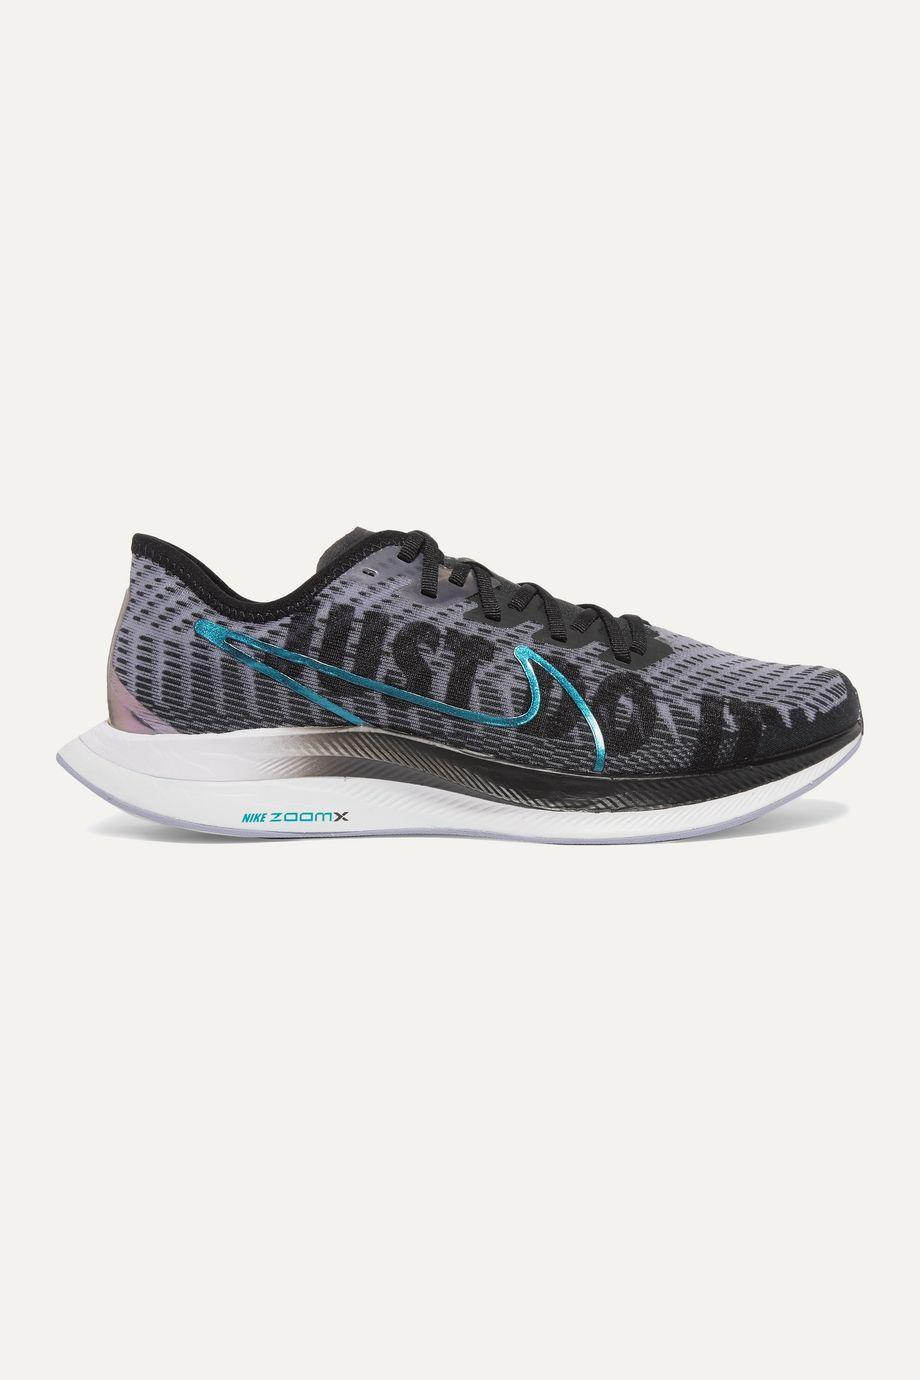 Nike Zoom Pegasus Turbo 2 Rise mesh sneakers